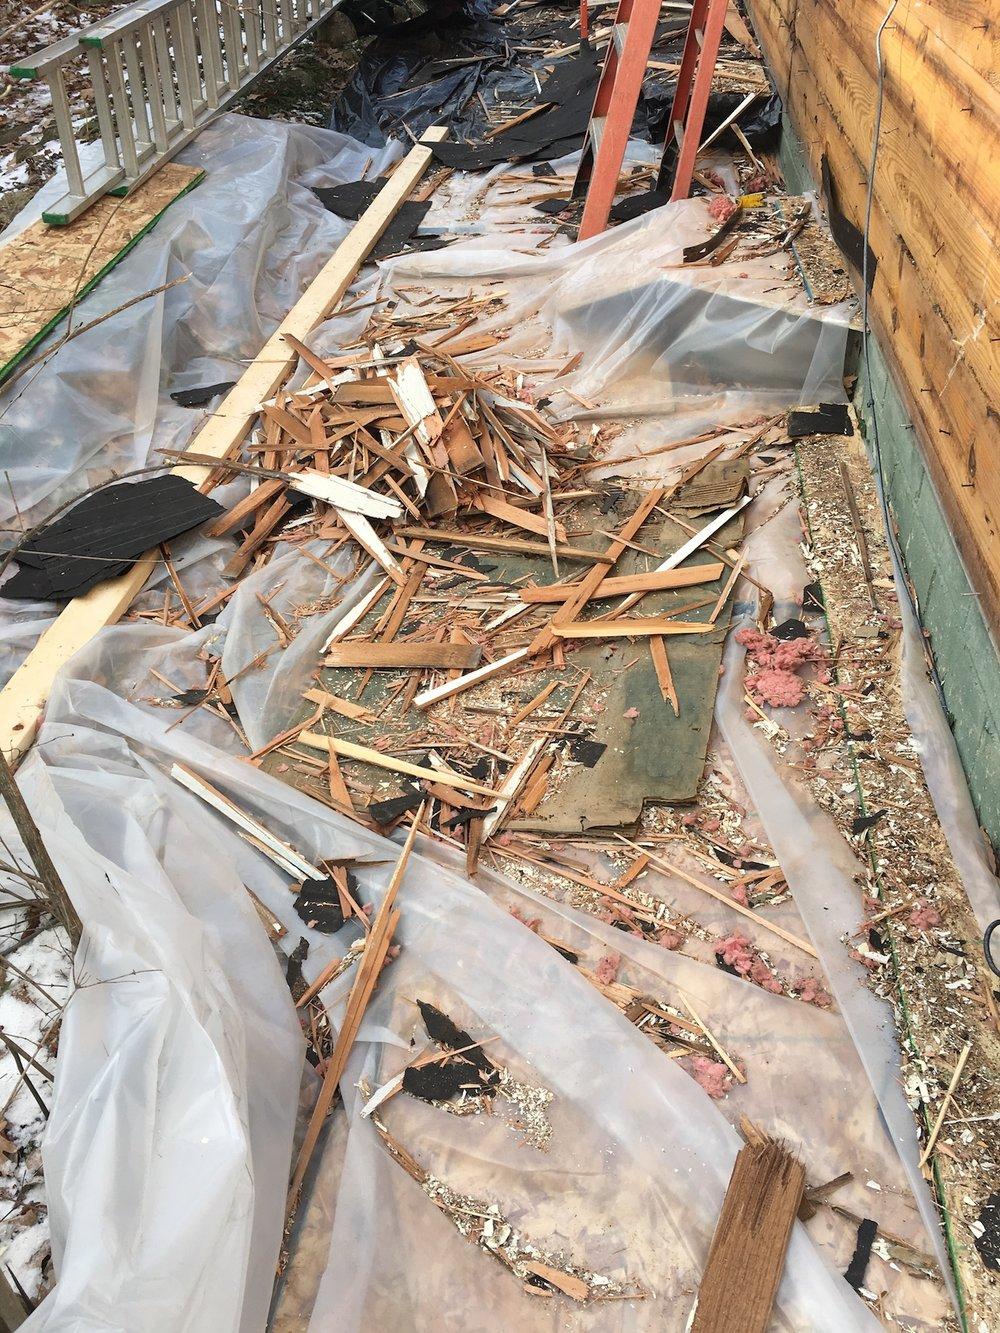 Debris from Demolition